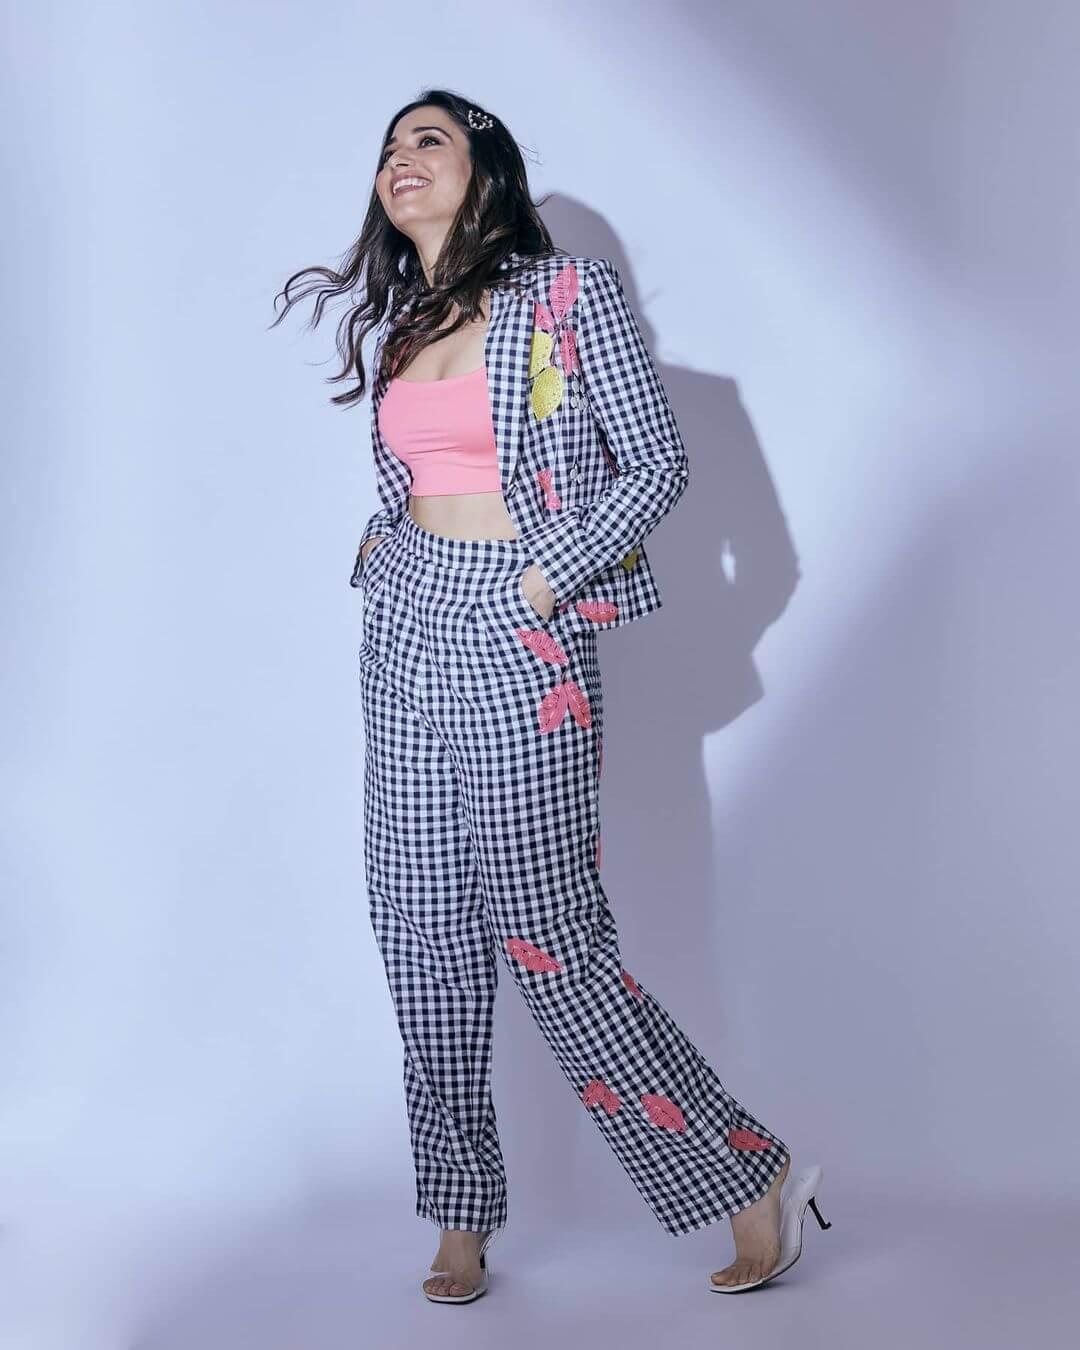 Tamannaah Bhatia checked Beautiful Floral Print Designer Dress